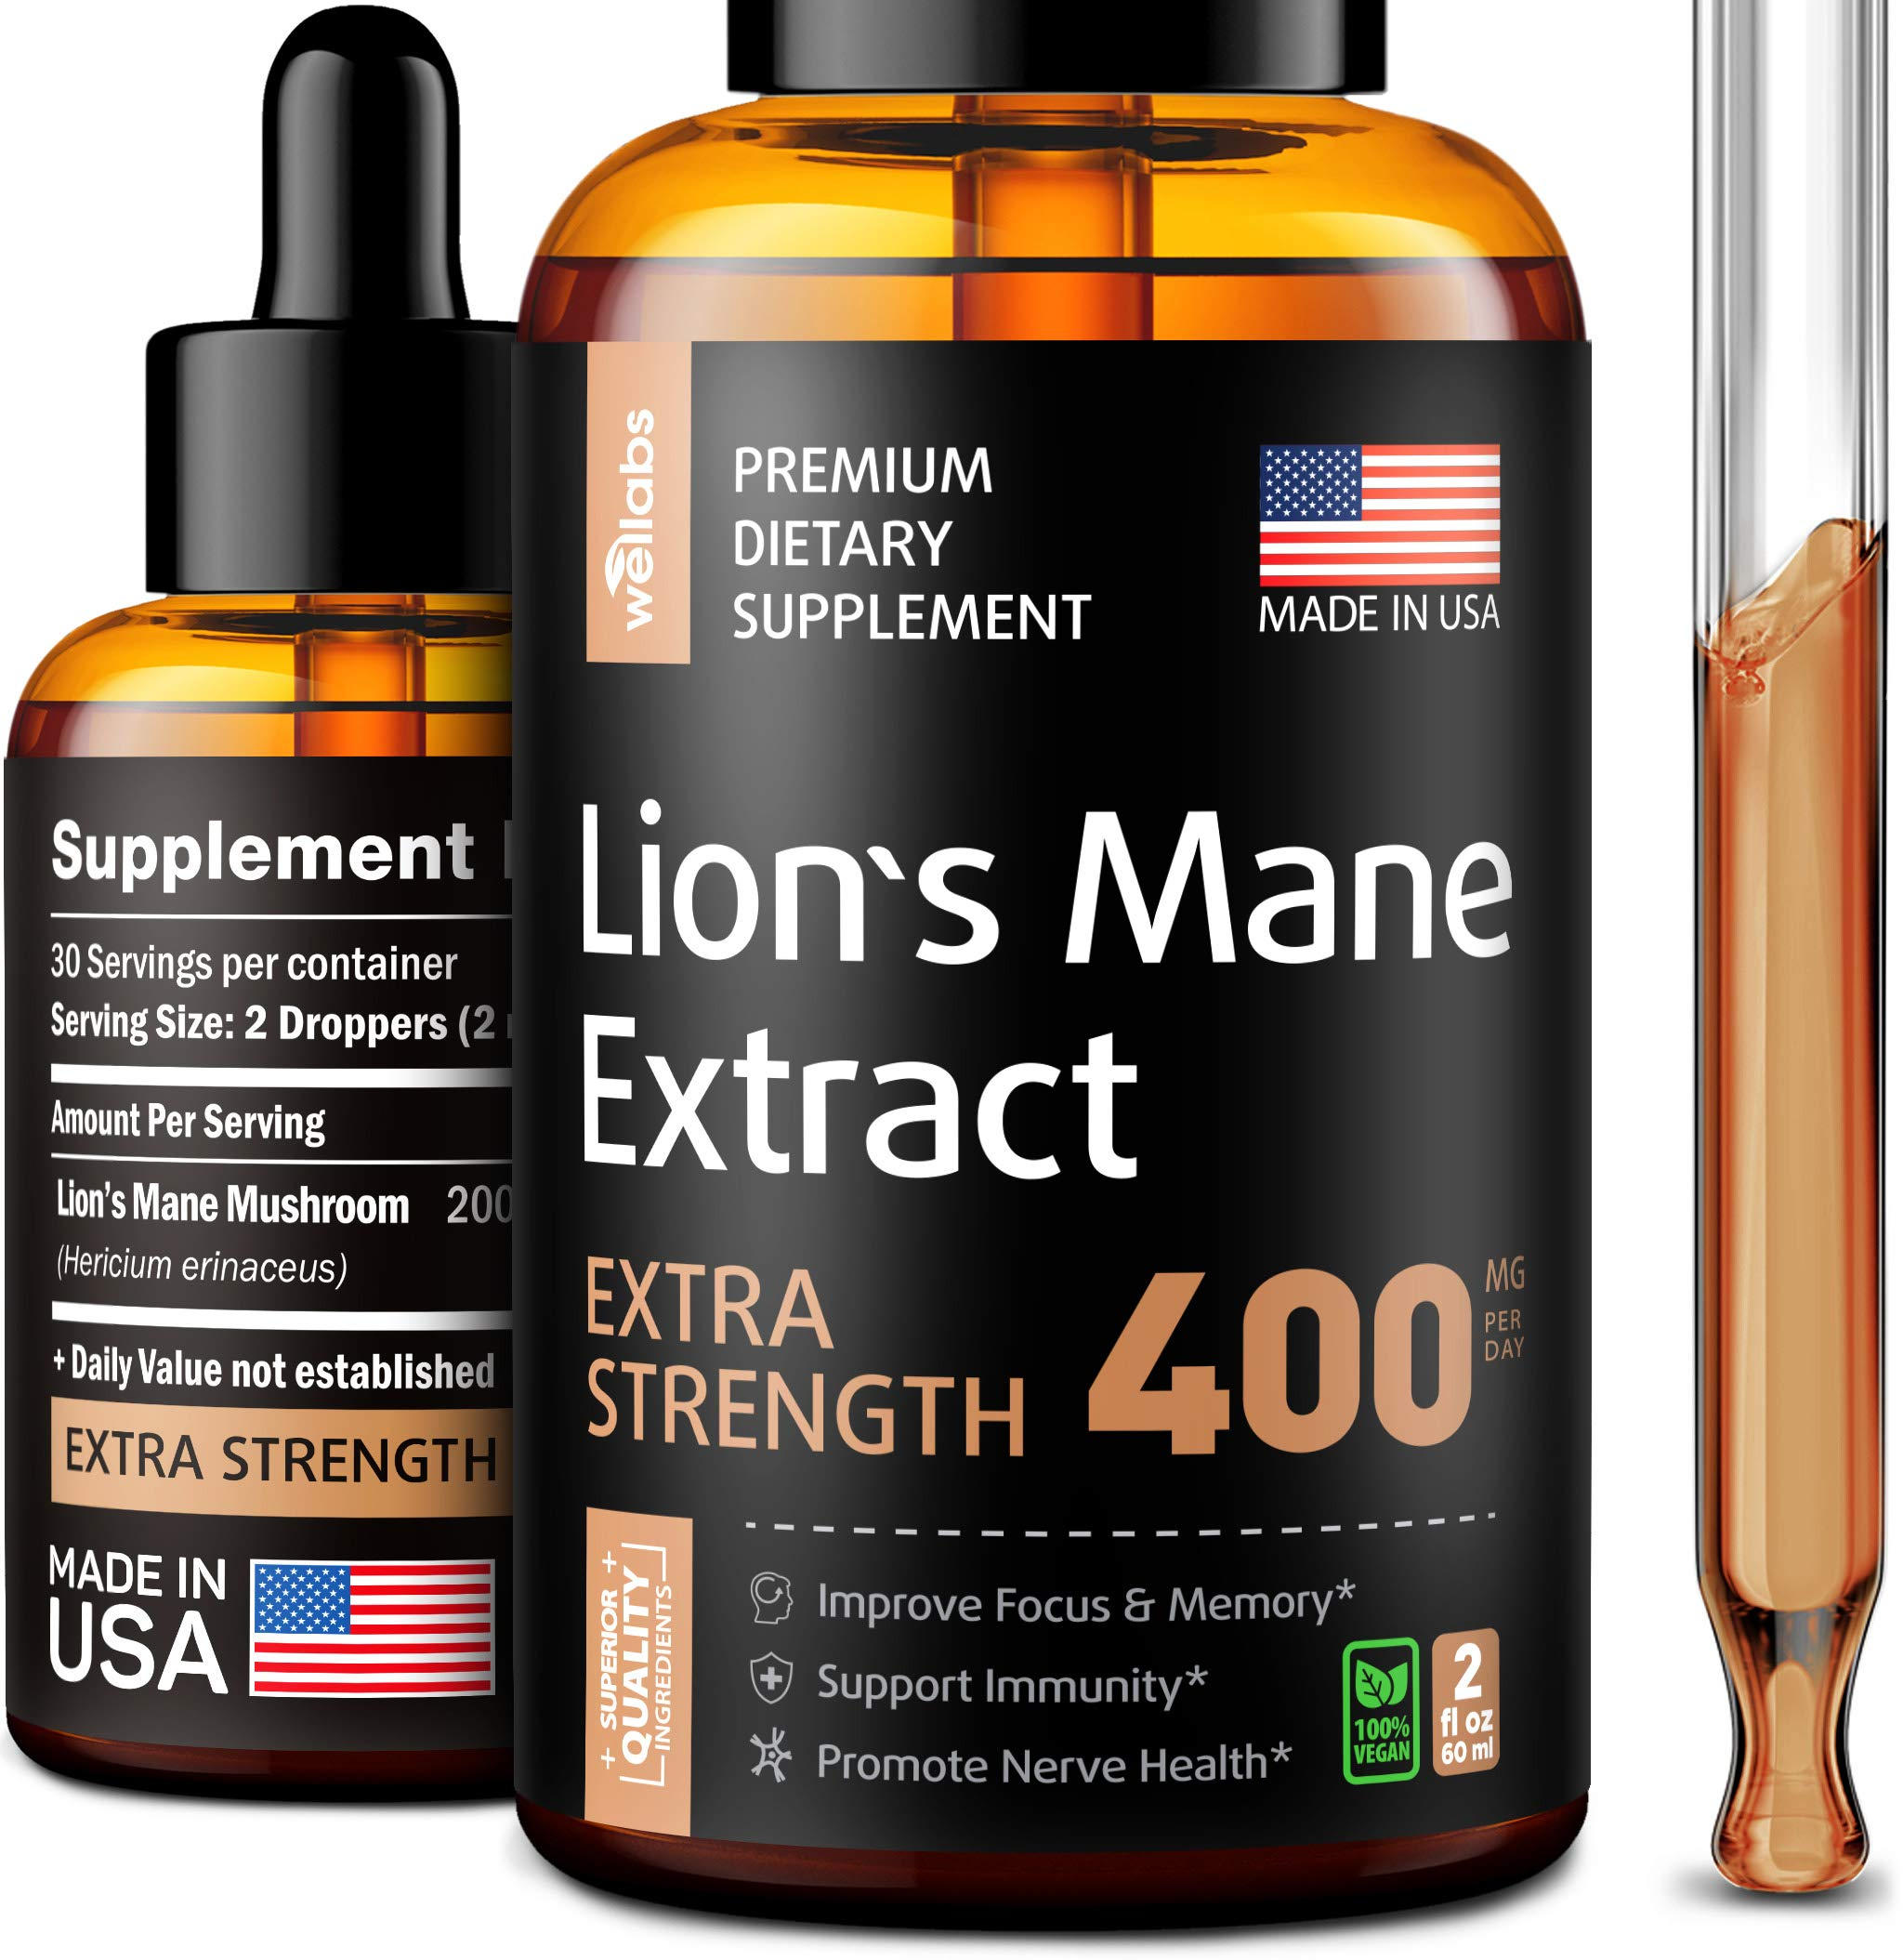 Lion's Mane Extract - Lion's Mane Mushroom Supplement for Immune Support - Lion's Mane Supplement - Made in USA - Lion's Mane Mushroom Complex for Mental Health - Liquid Mushroom Supplement